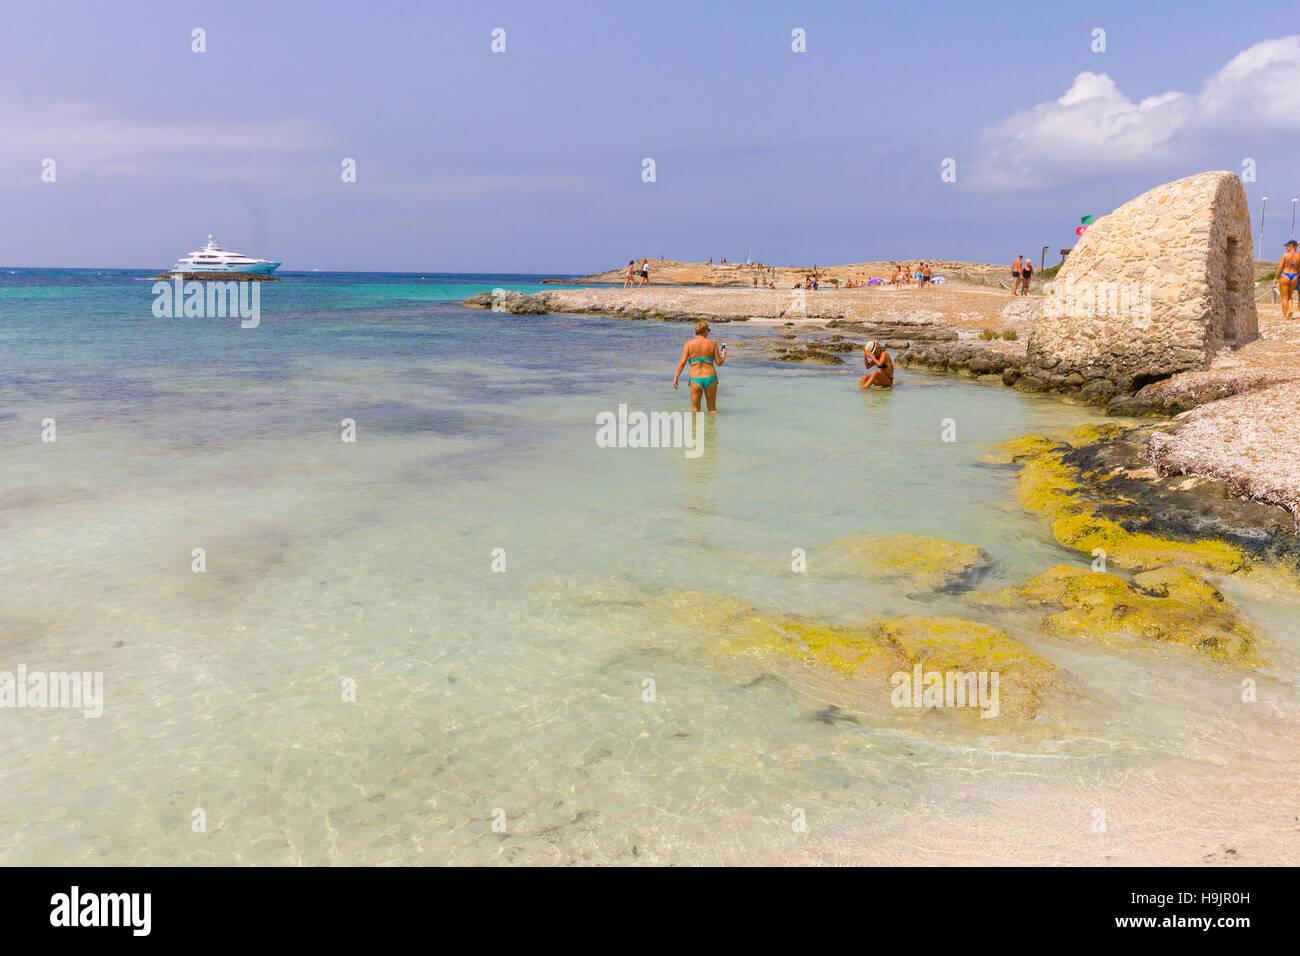 playa de ses illetes balearic islands